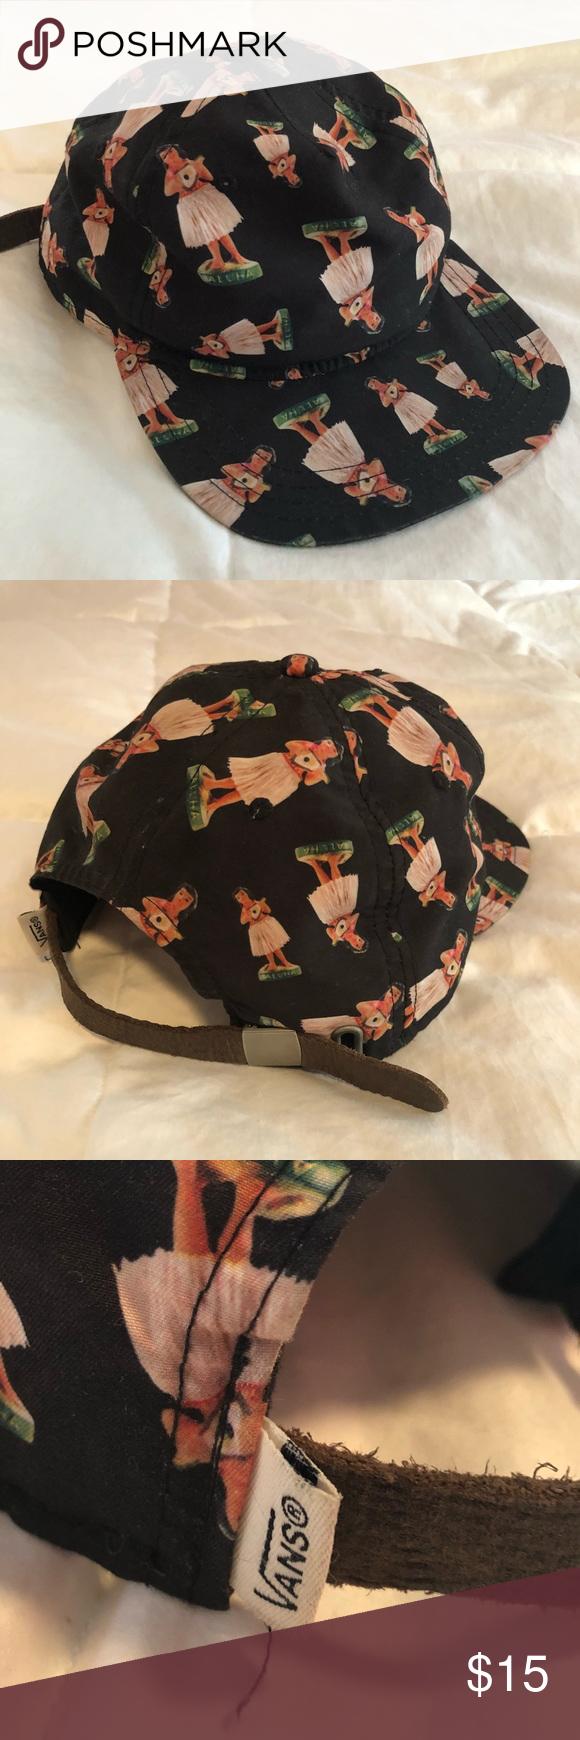 ... uk availability d0908 22535 Vans hula girl hat Hula Vans Accessories  Hats ... fa83910aee5